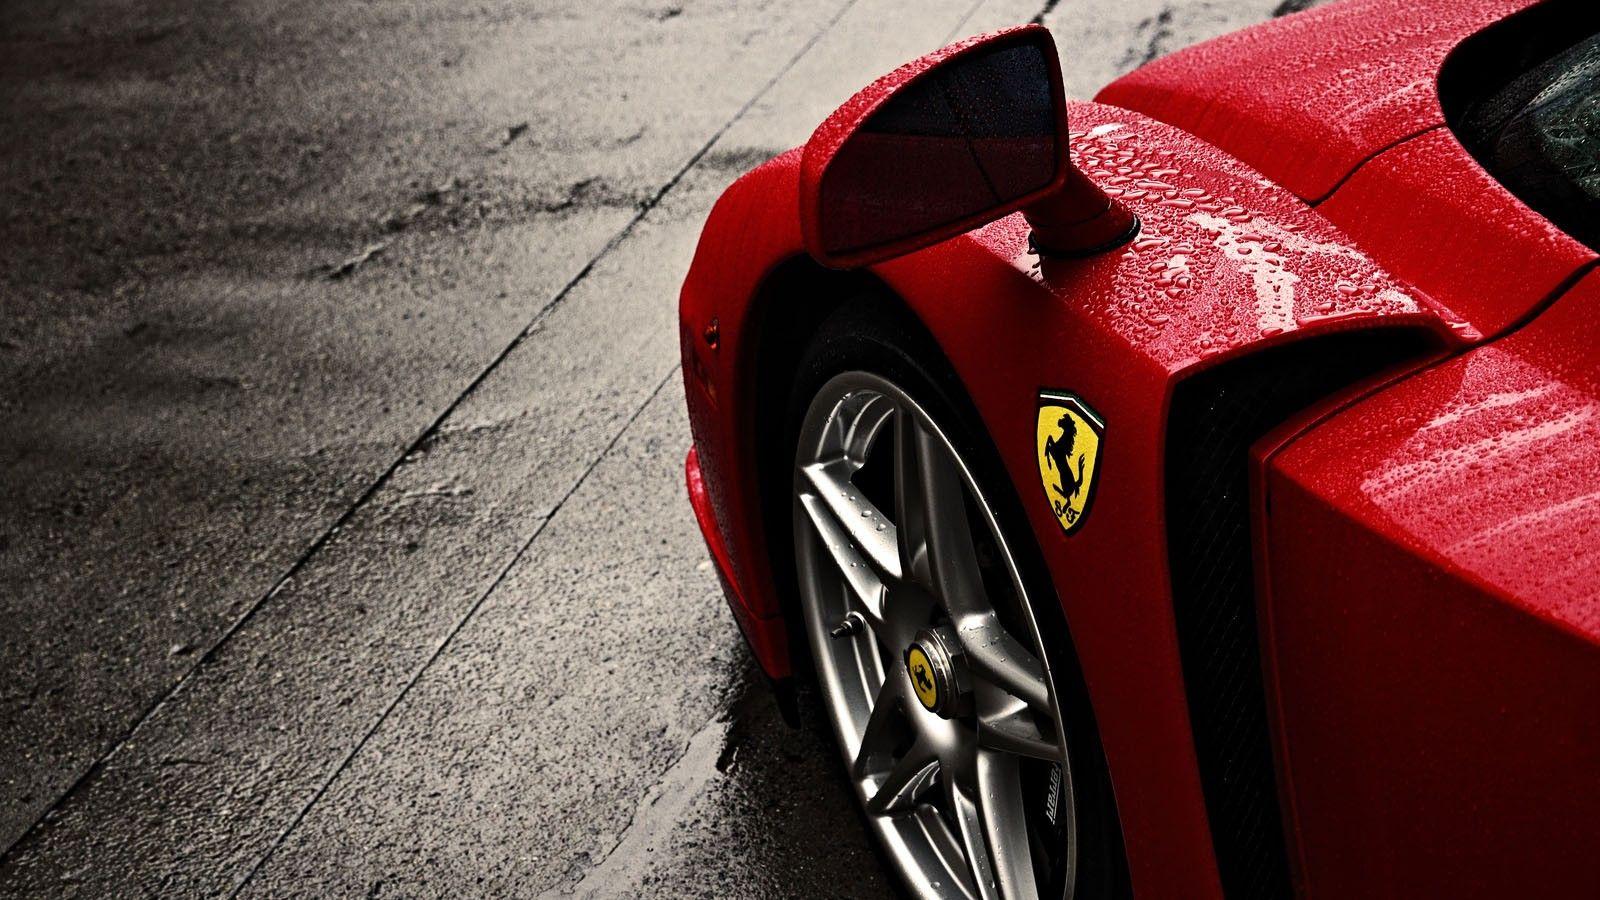 Ferrari Wallpapers Wide ~ Sdeerwallpaper